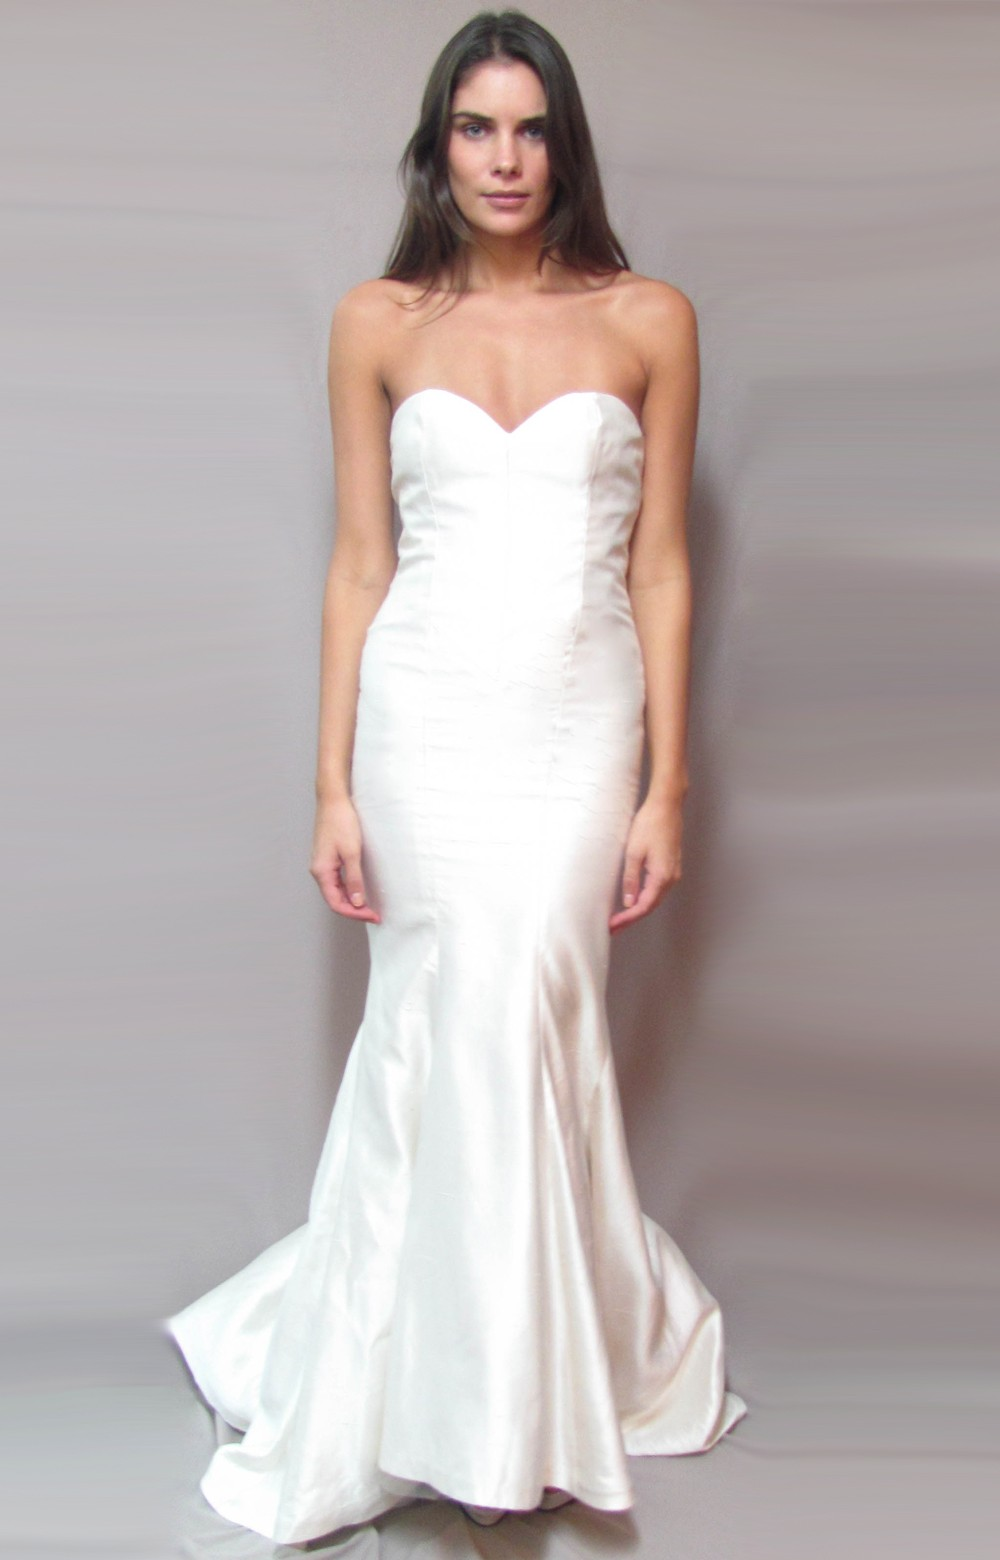 Lyst - Nicole miller Allie Bridal Gown in White